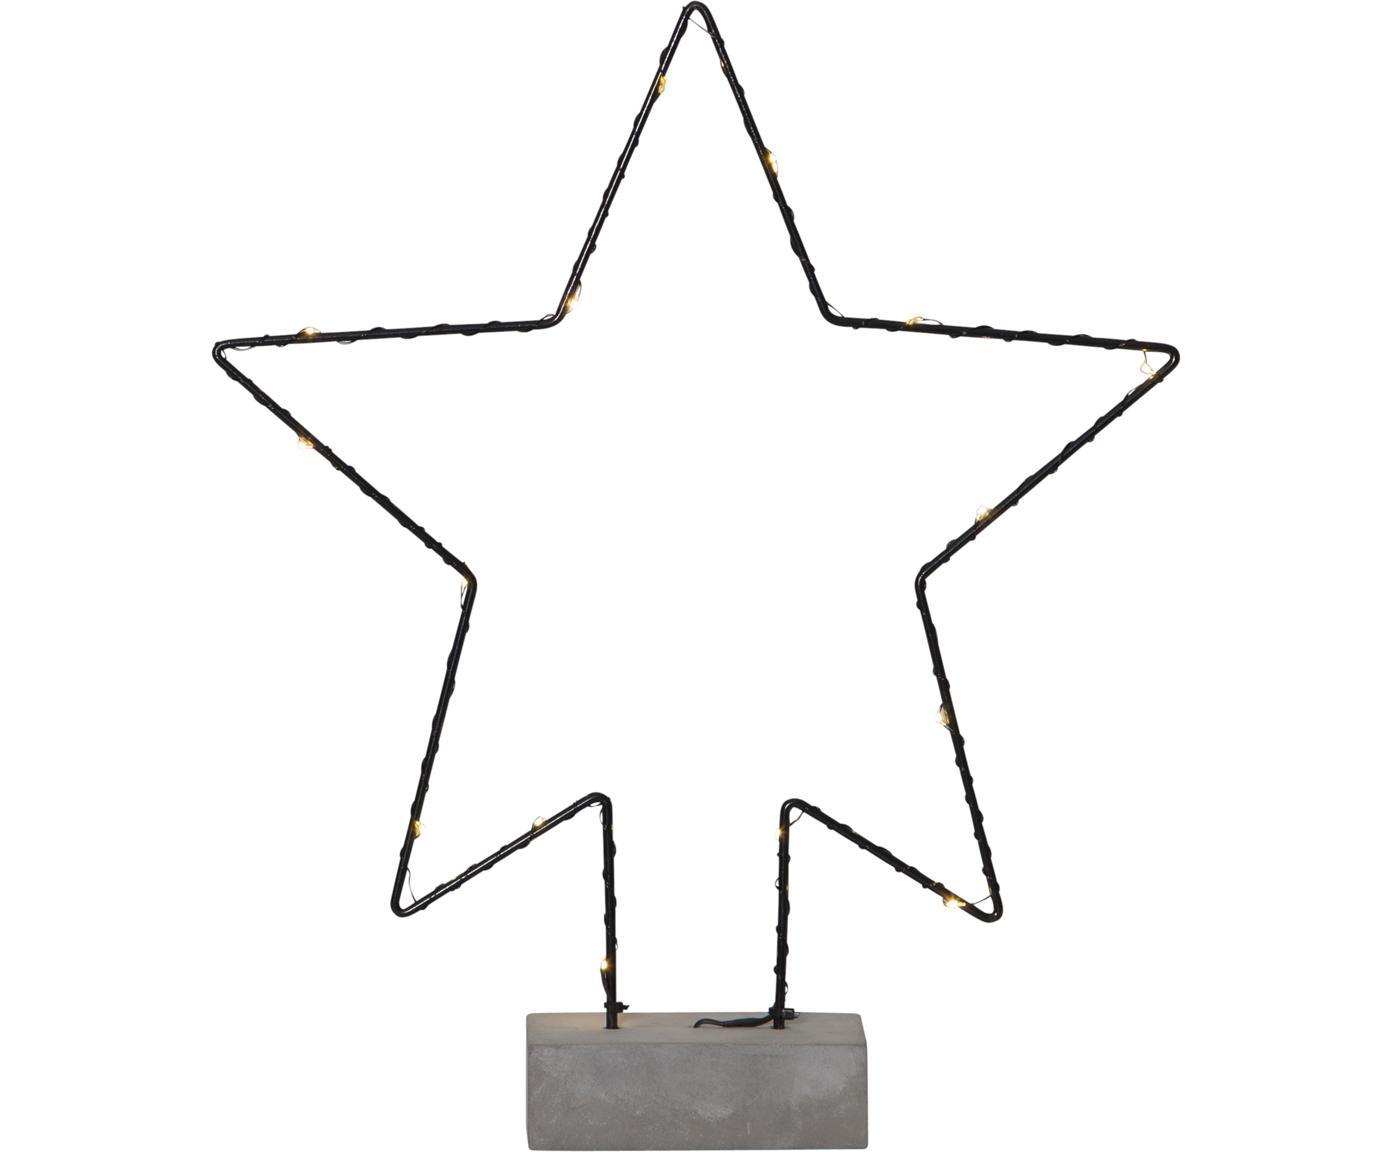 LED Leuchtobjekt Cemmy, batteriebetrieben, Sockel: Beton, Schwarz, Betongrau, 30 x 36 cm